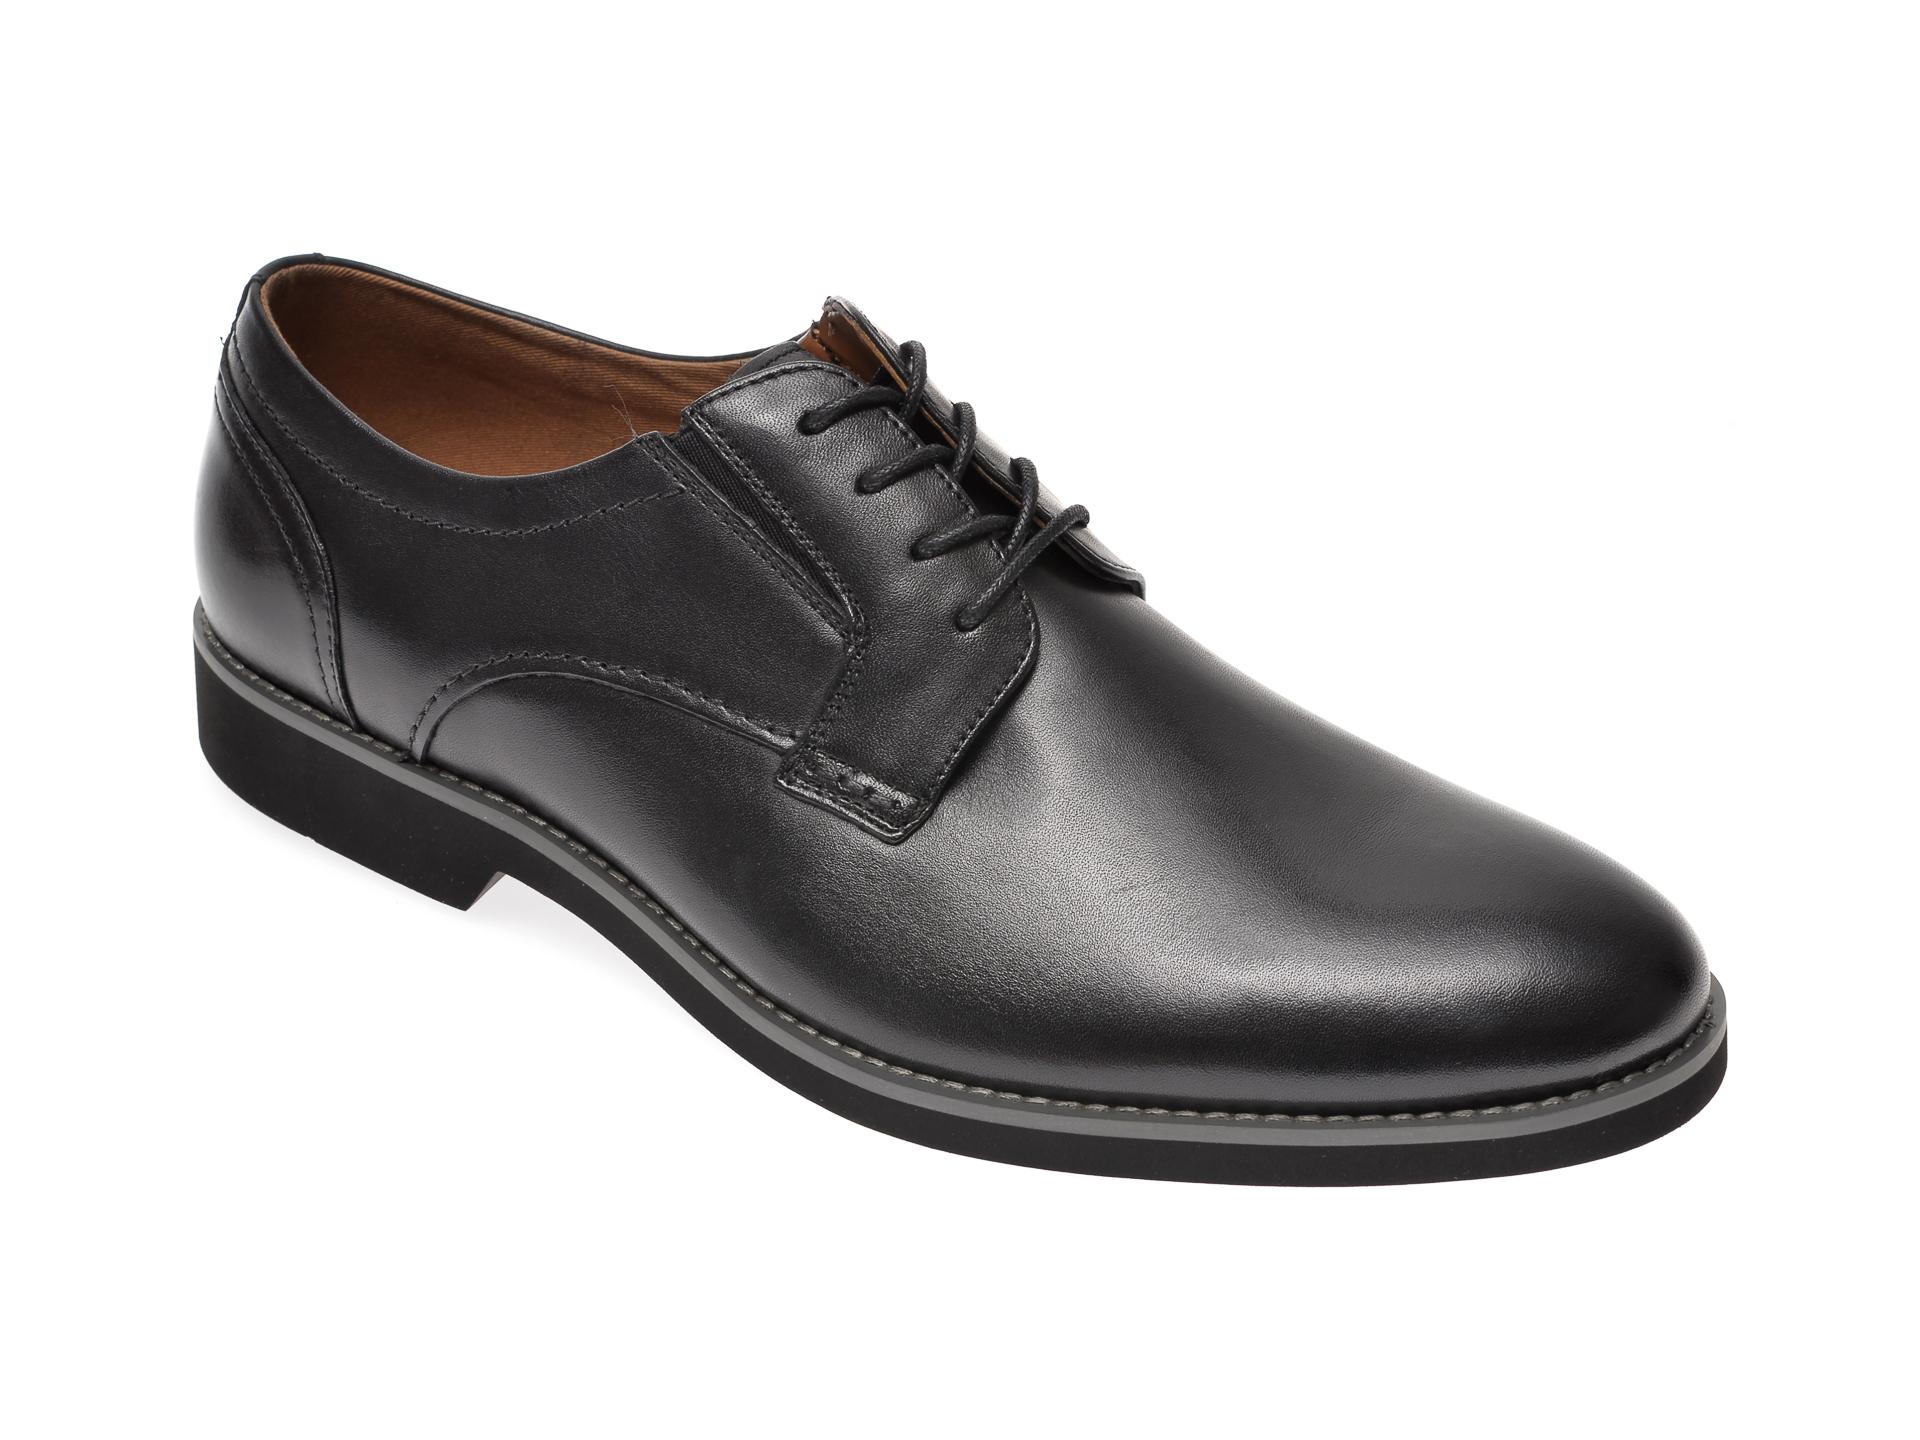 Pantofi ALDO negri, Rorelind001, din piele naturala imagine